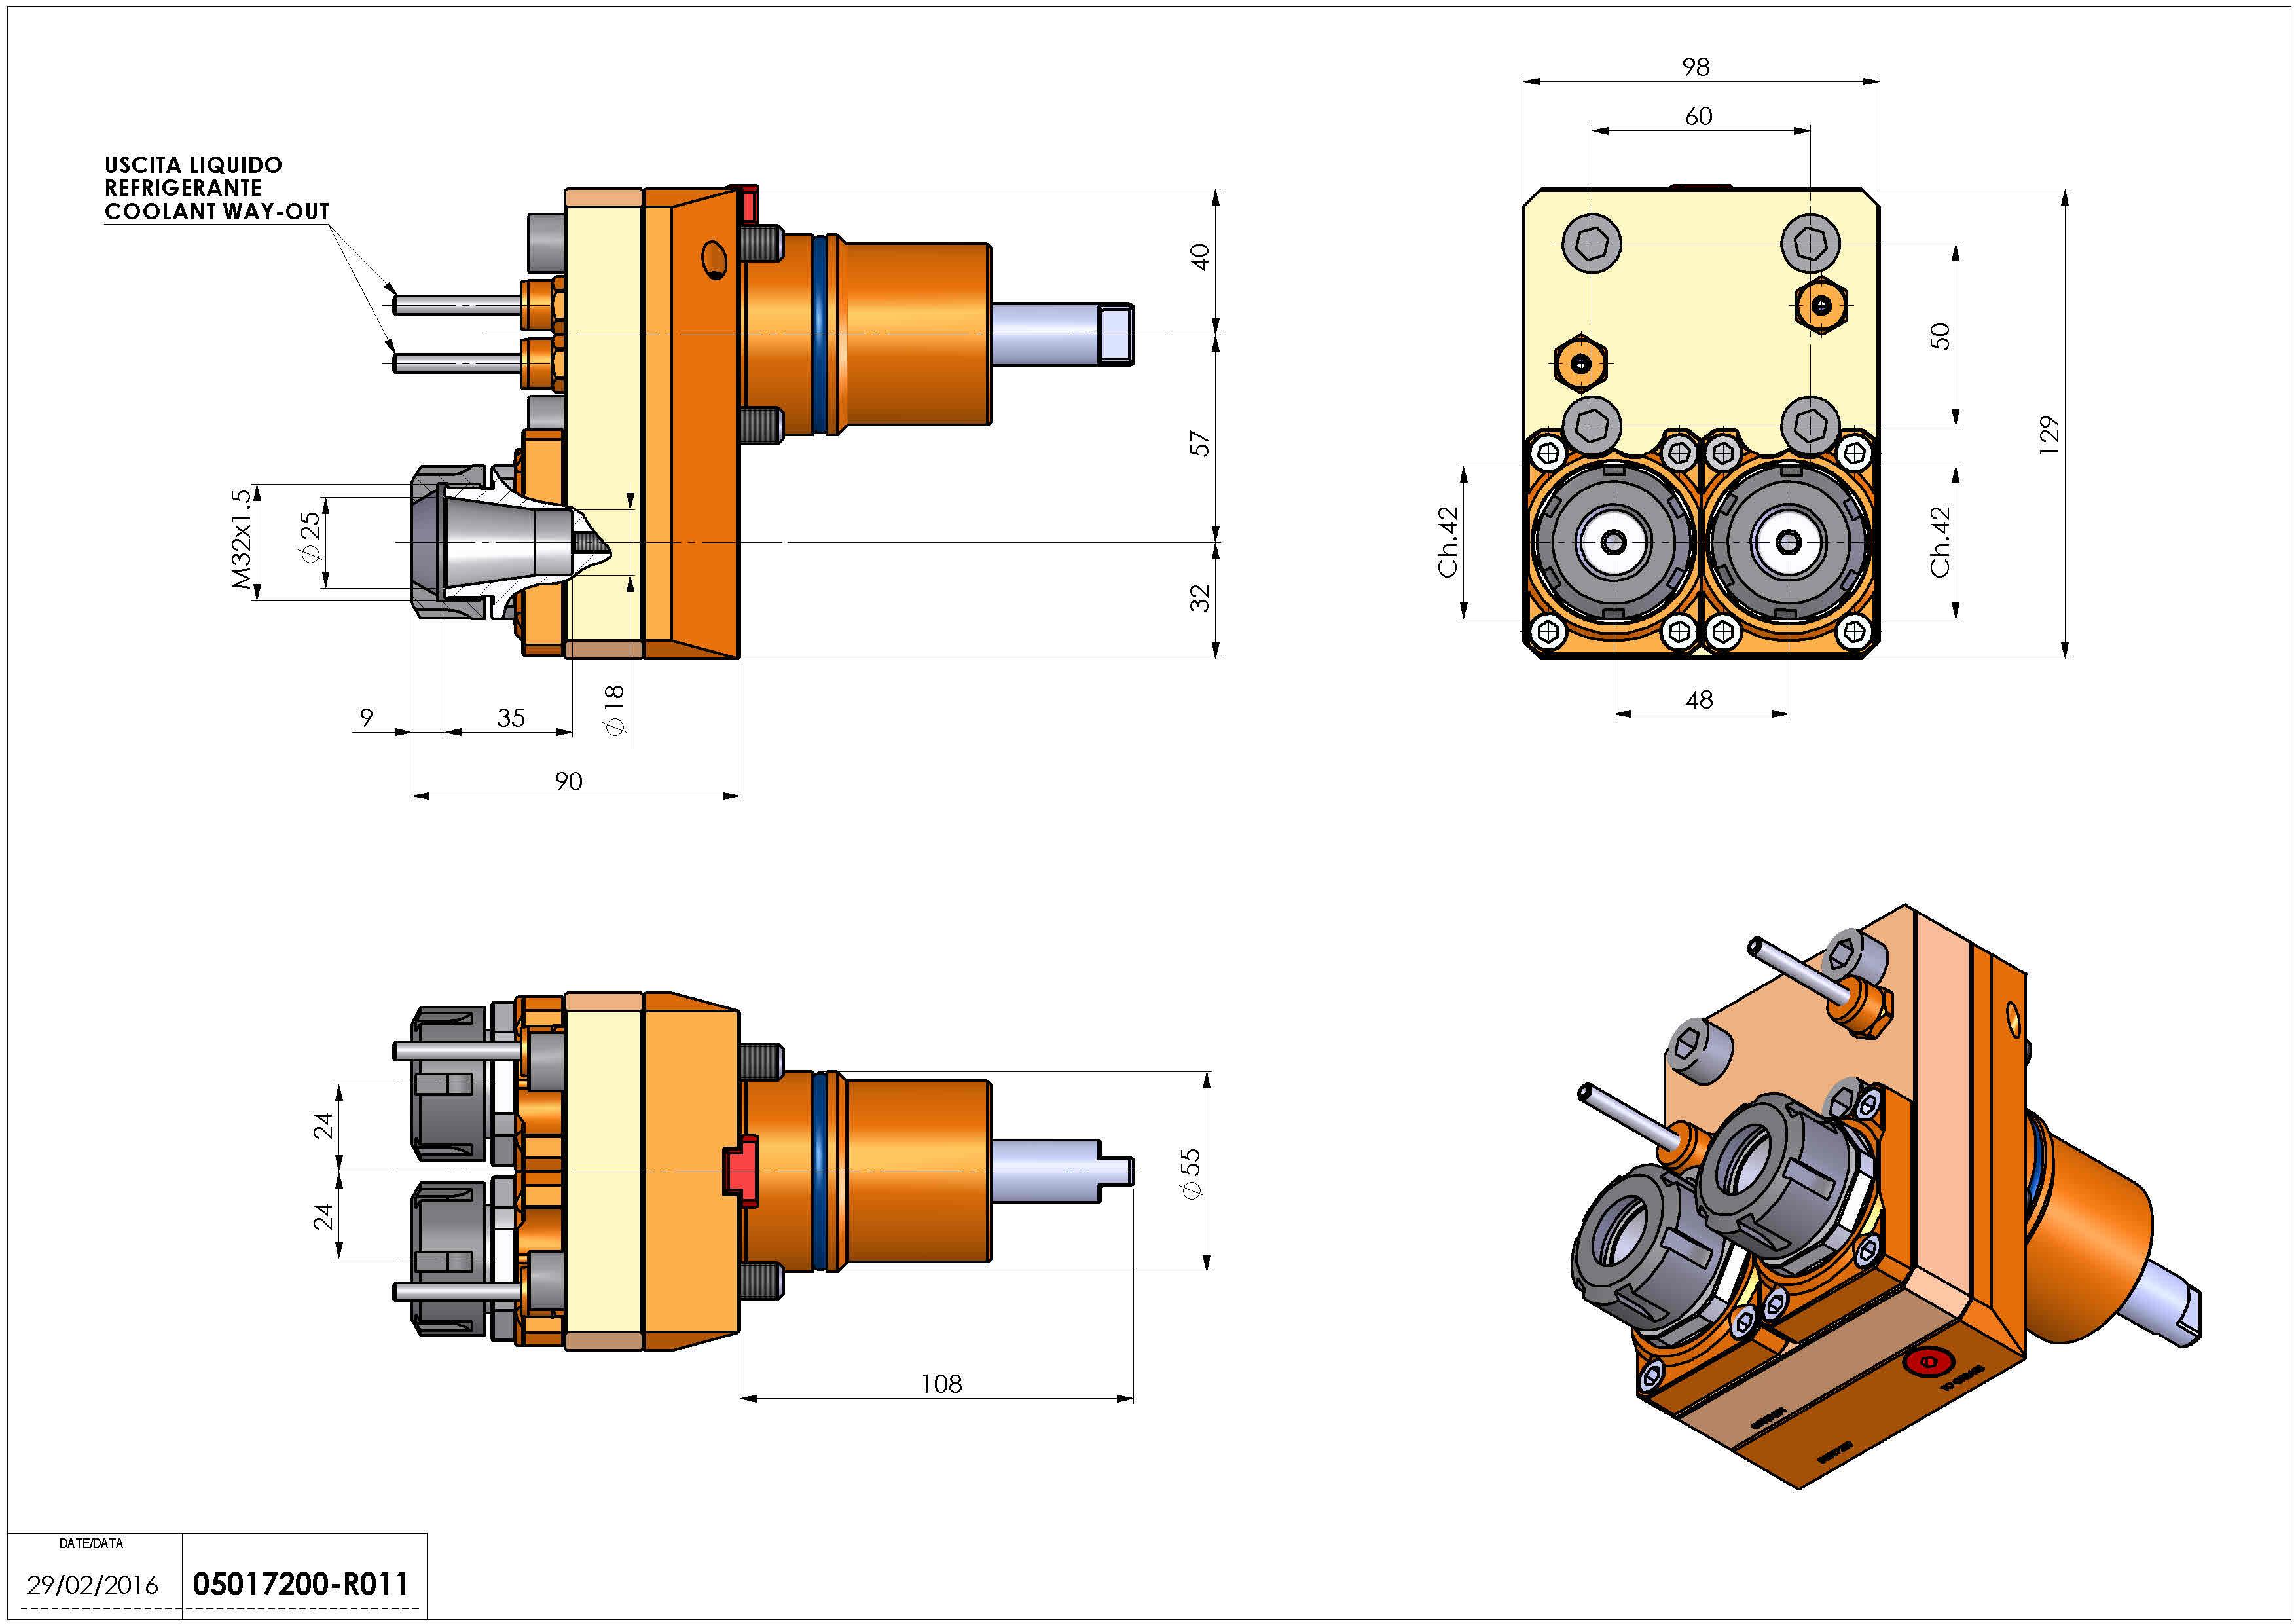 Technical image - LT-S2 D55 ER25 OFS-57 H90 NK.